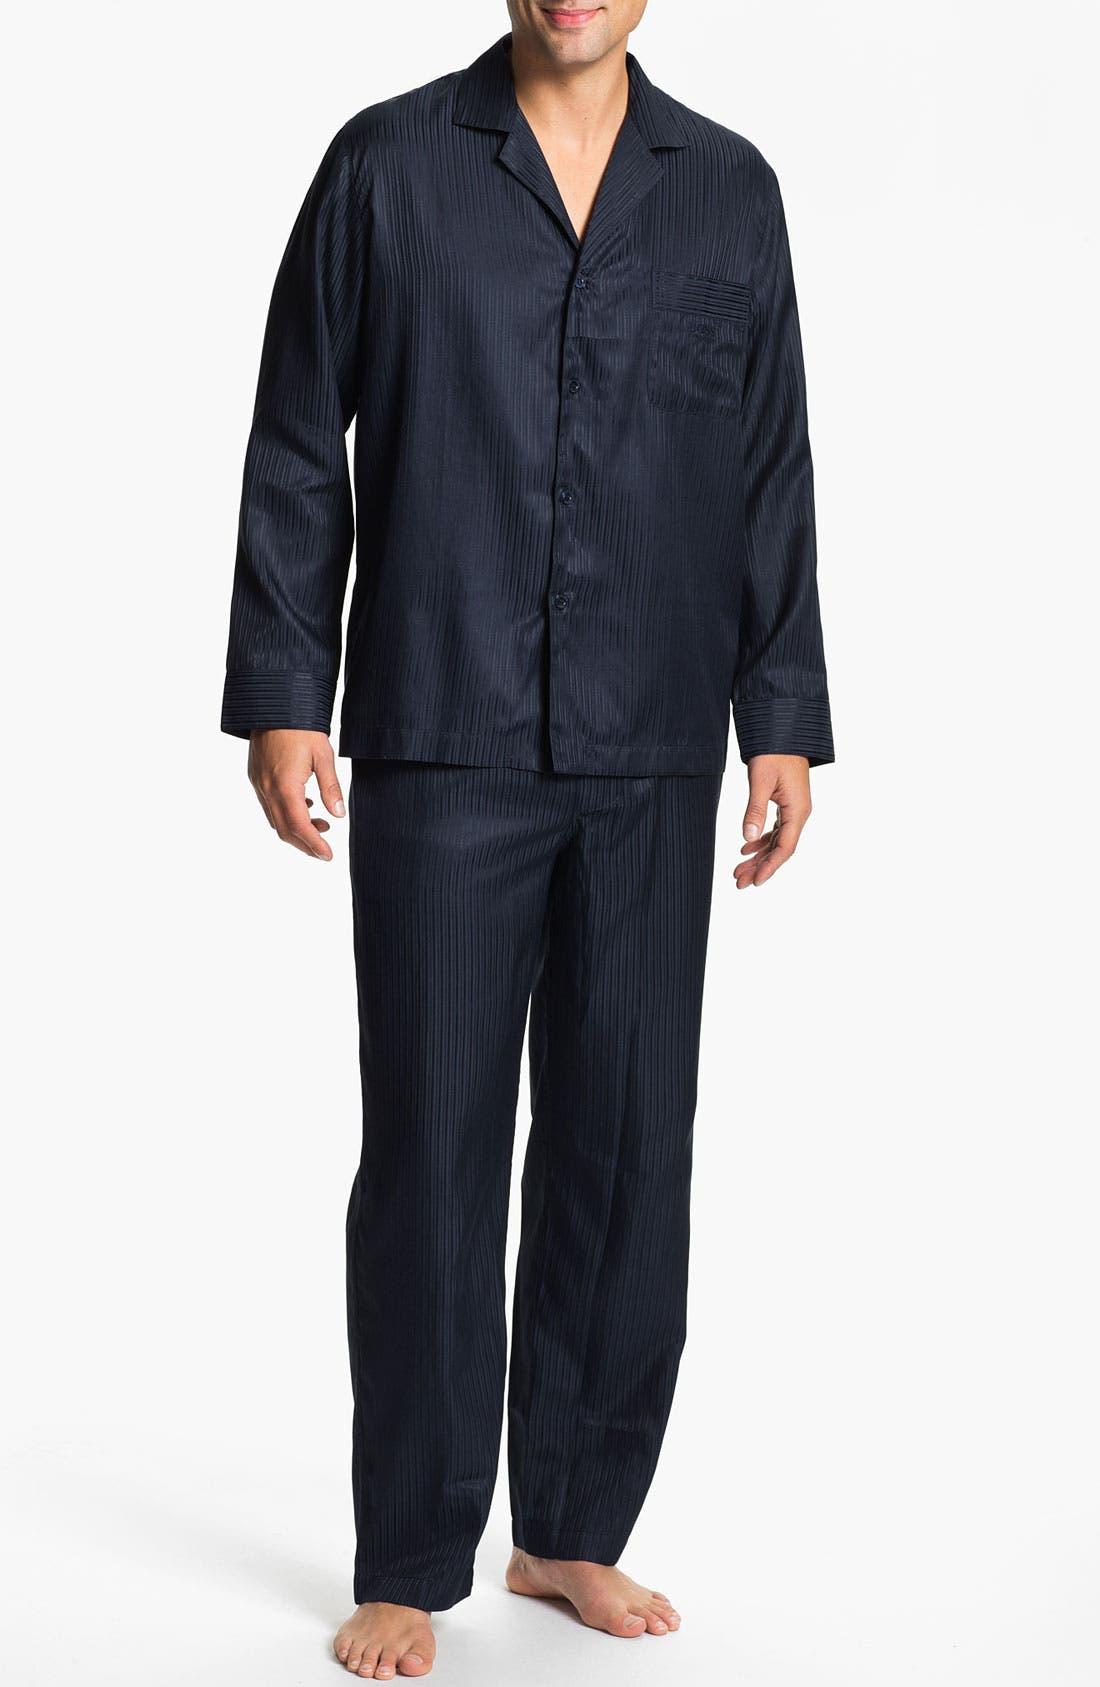 Alternate Image 1 Selected - BOSS Black 'Innovation 4' Woven Silk & Cotton Pajama Set